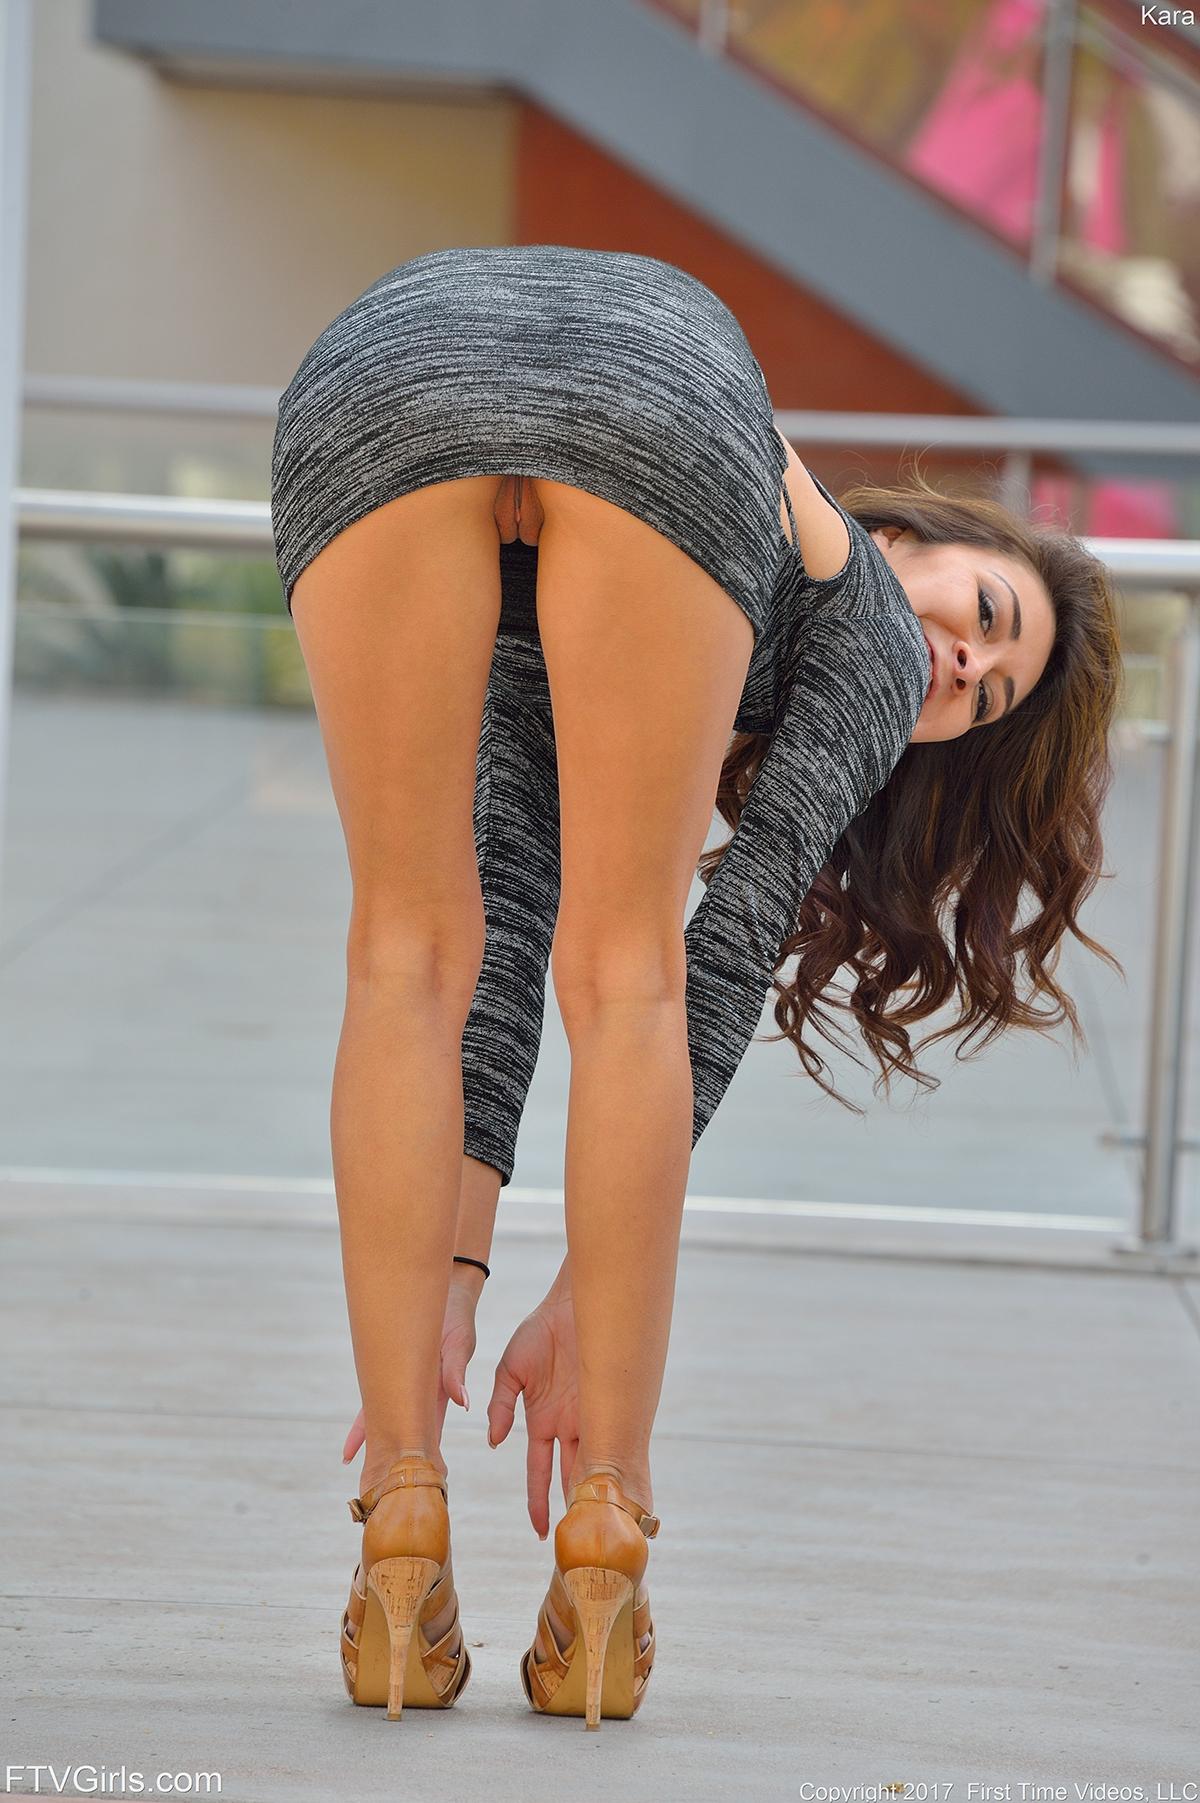 Телка в юбке нагнулась картинки секс порно